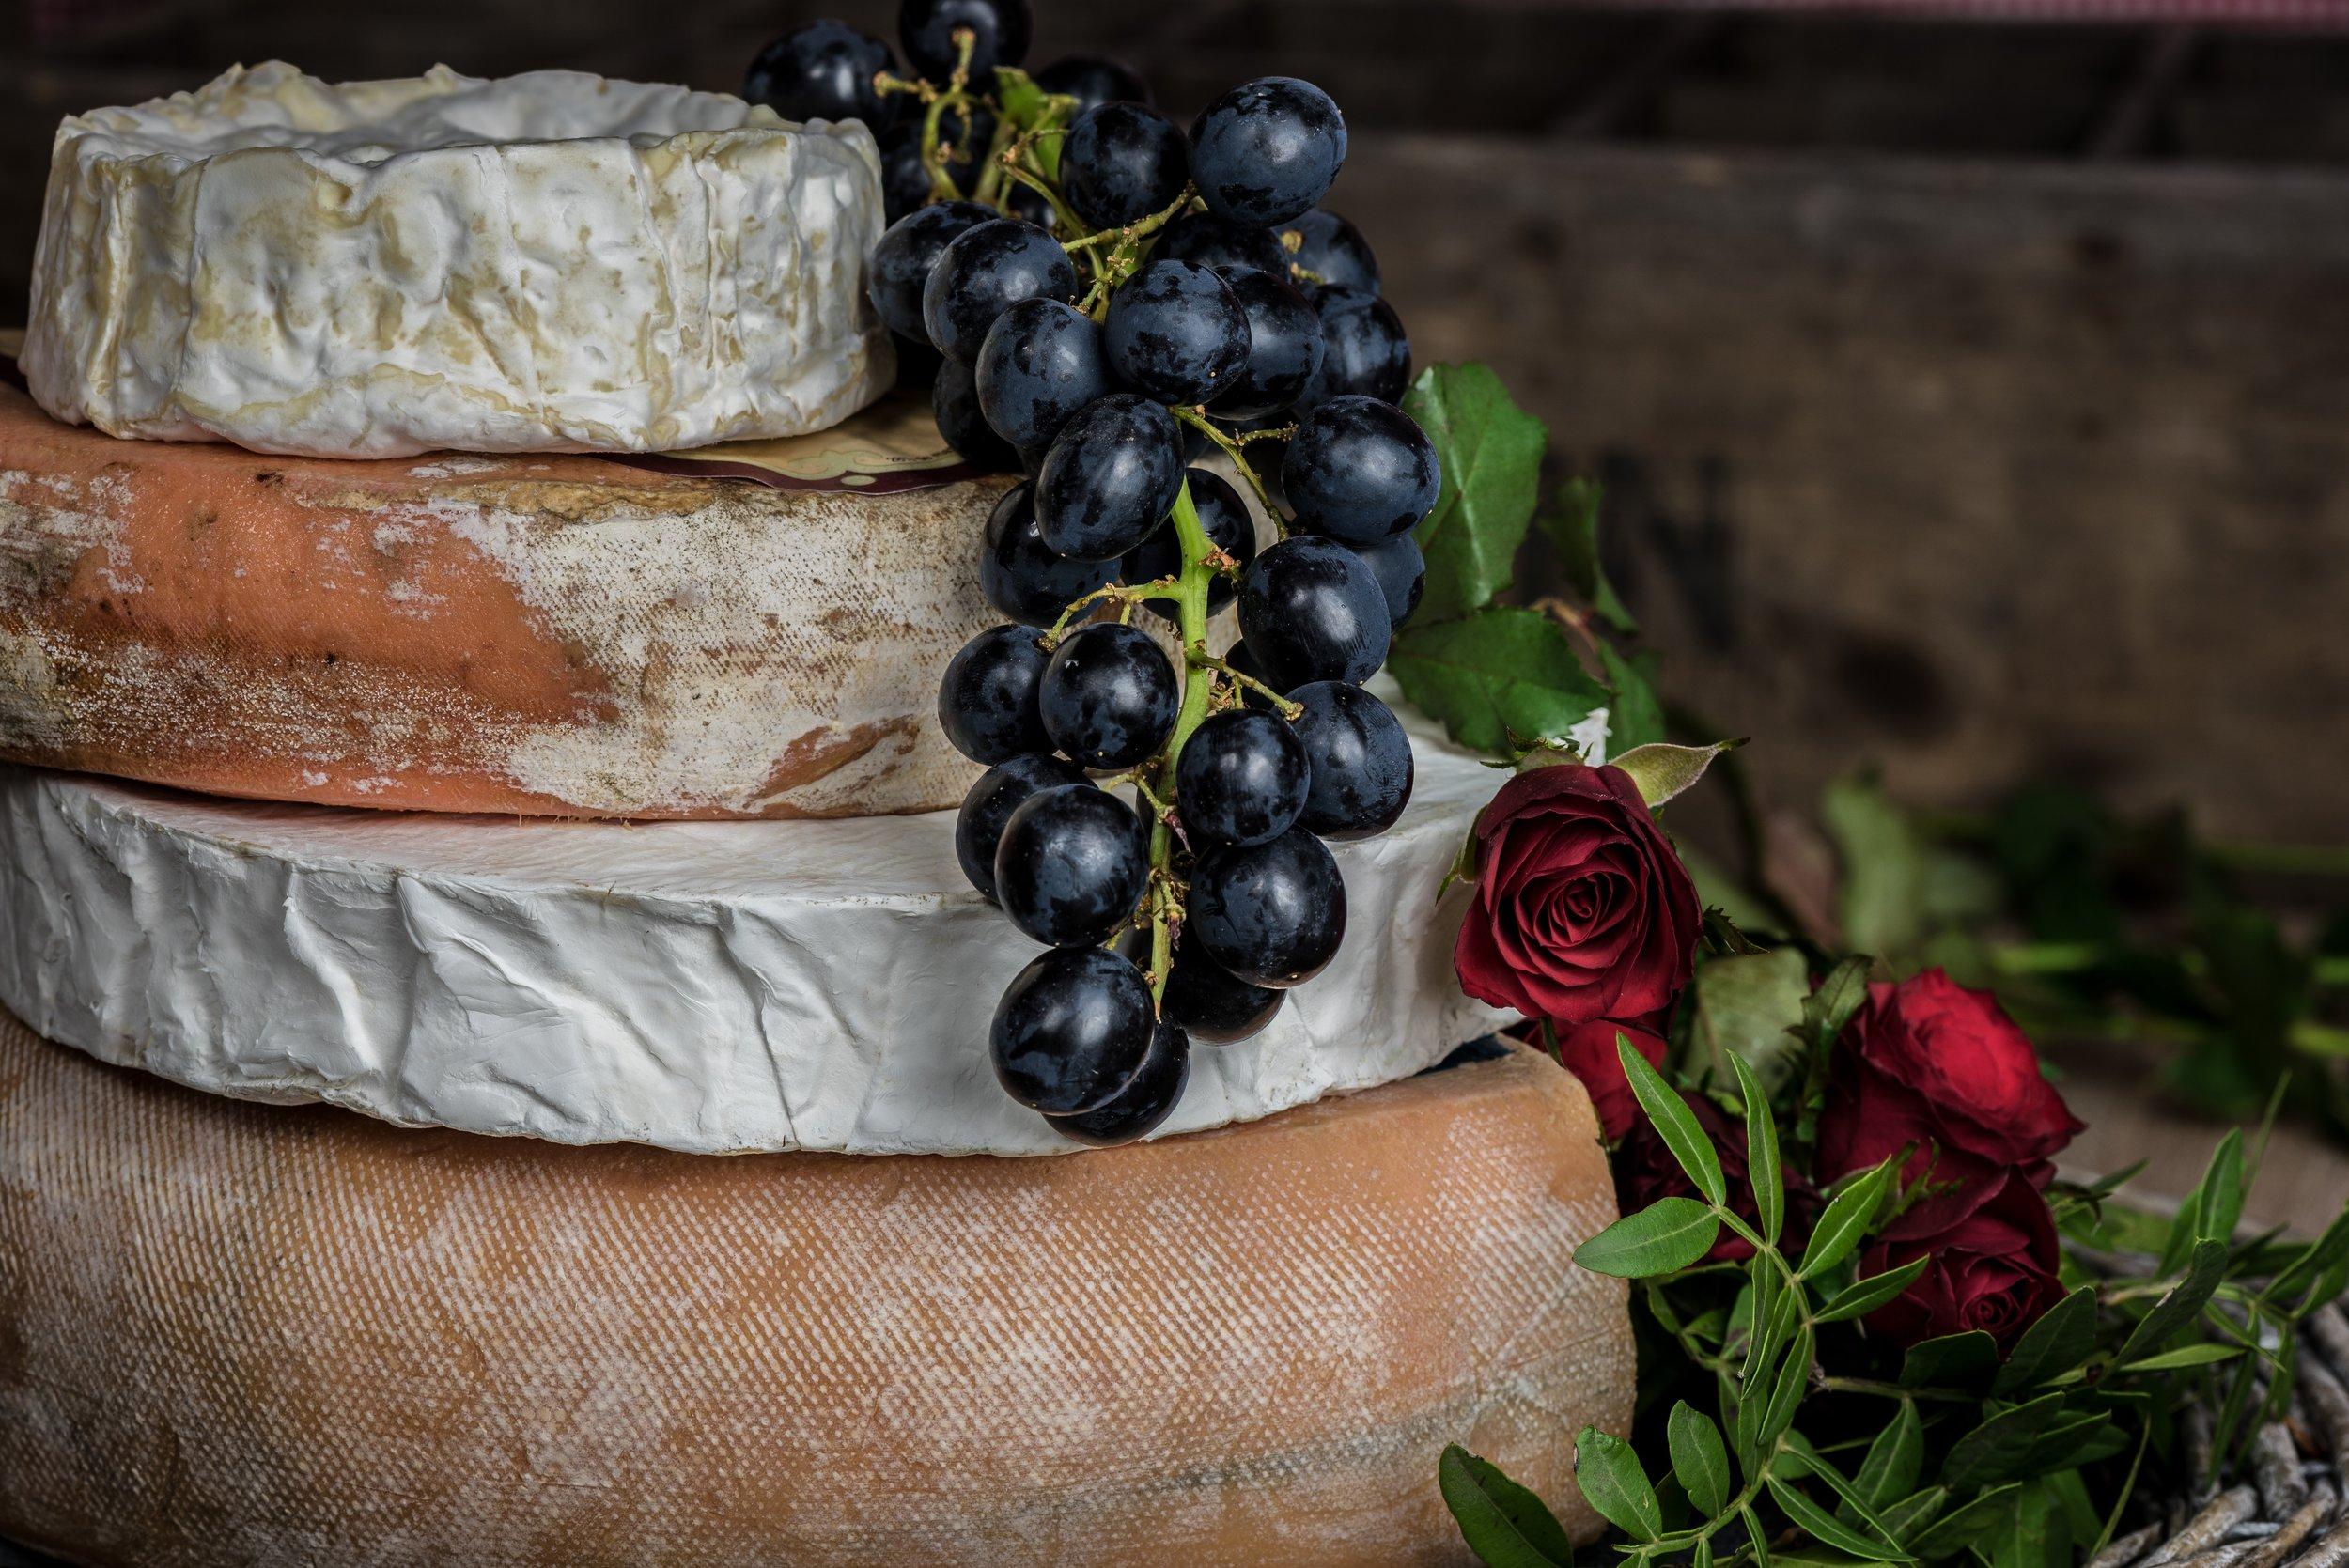 Say cheese! - Photo by Jez Timmson Unsplash